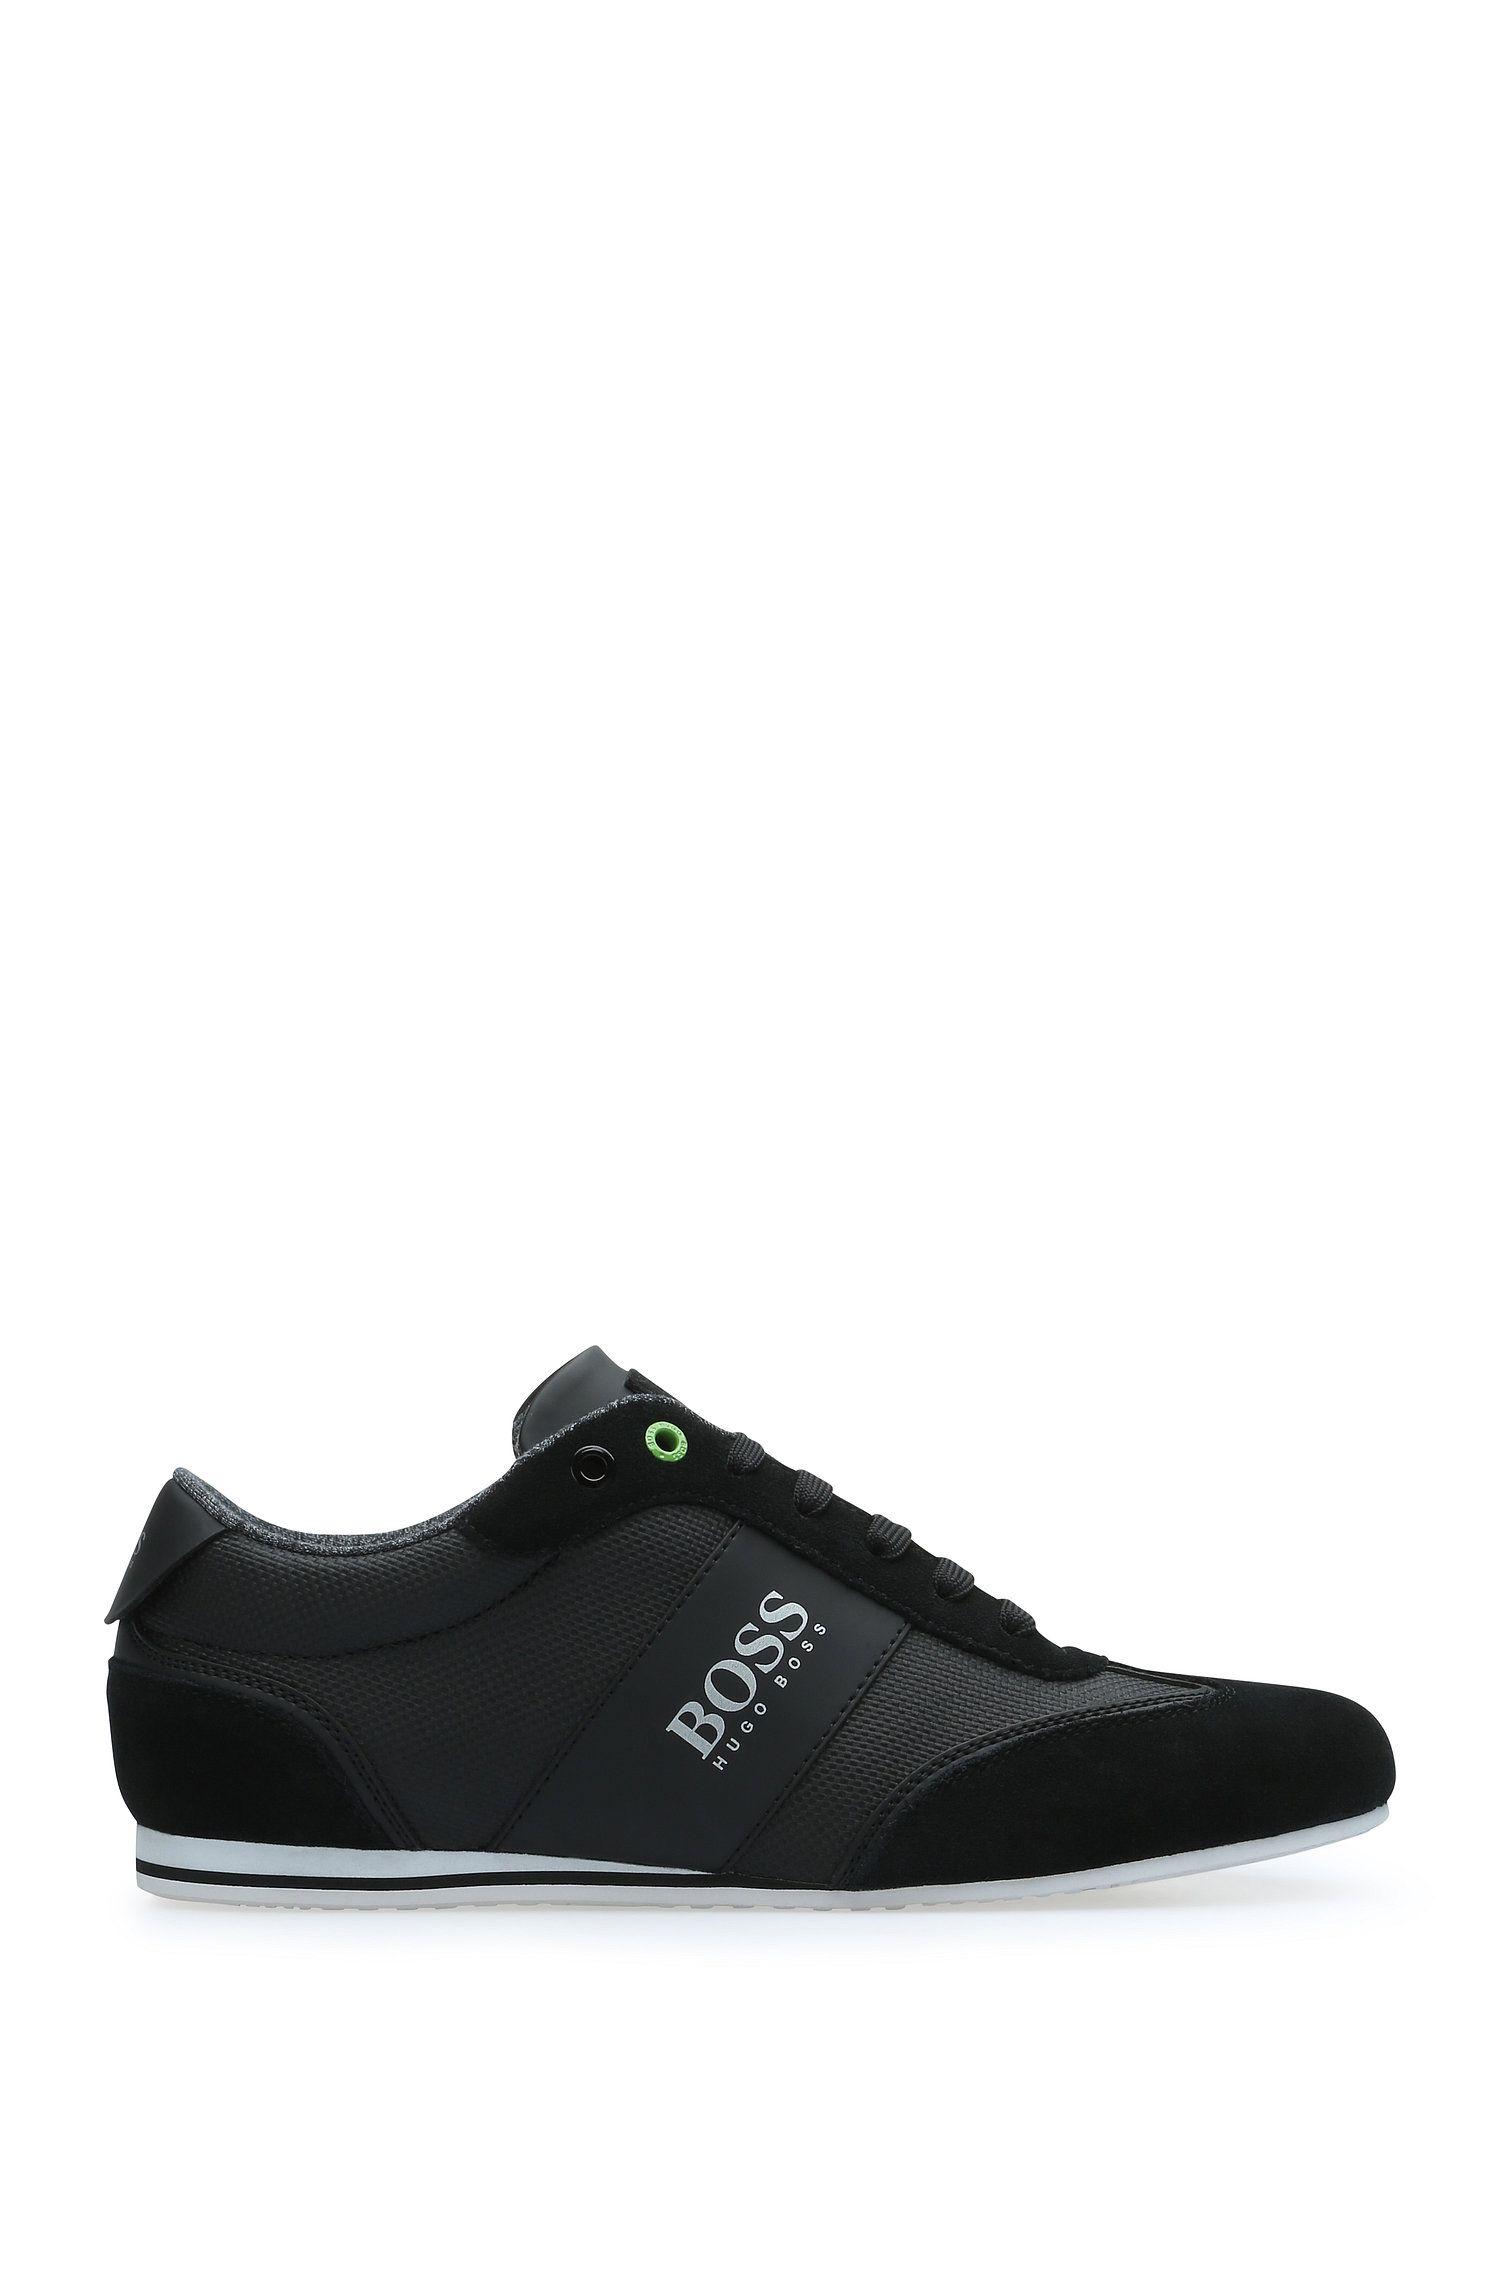 Sneakers aus Material-Mix mit Textil und Leder: ´Lighter_Lowp_cvc`